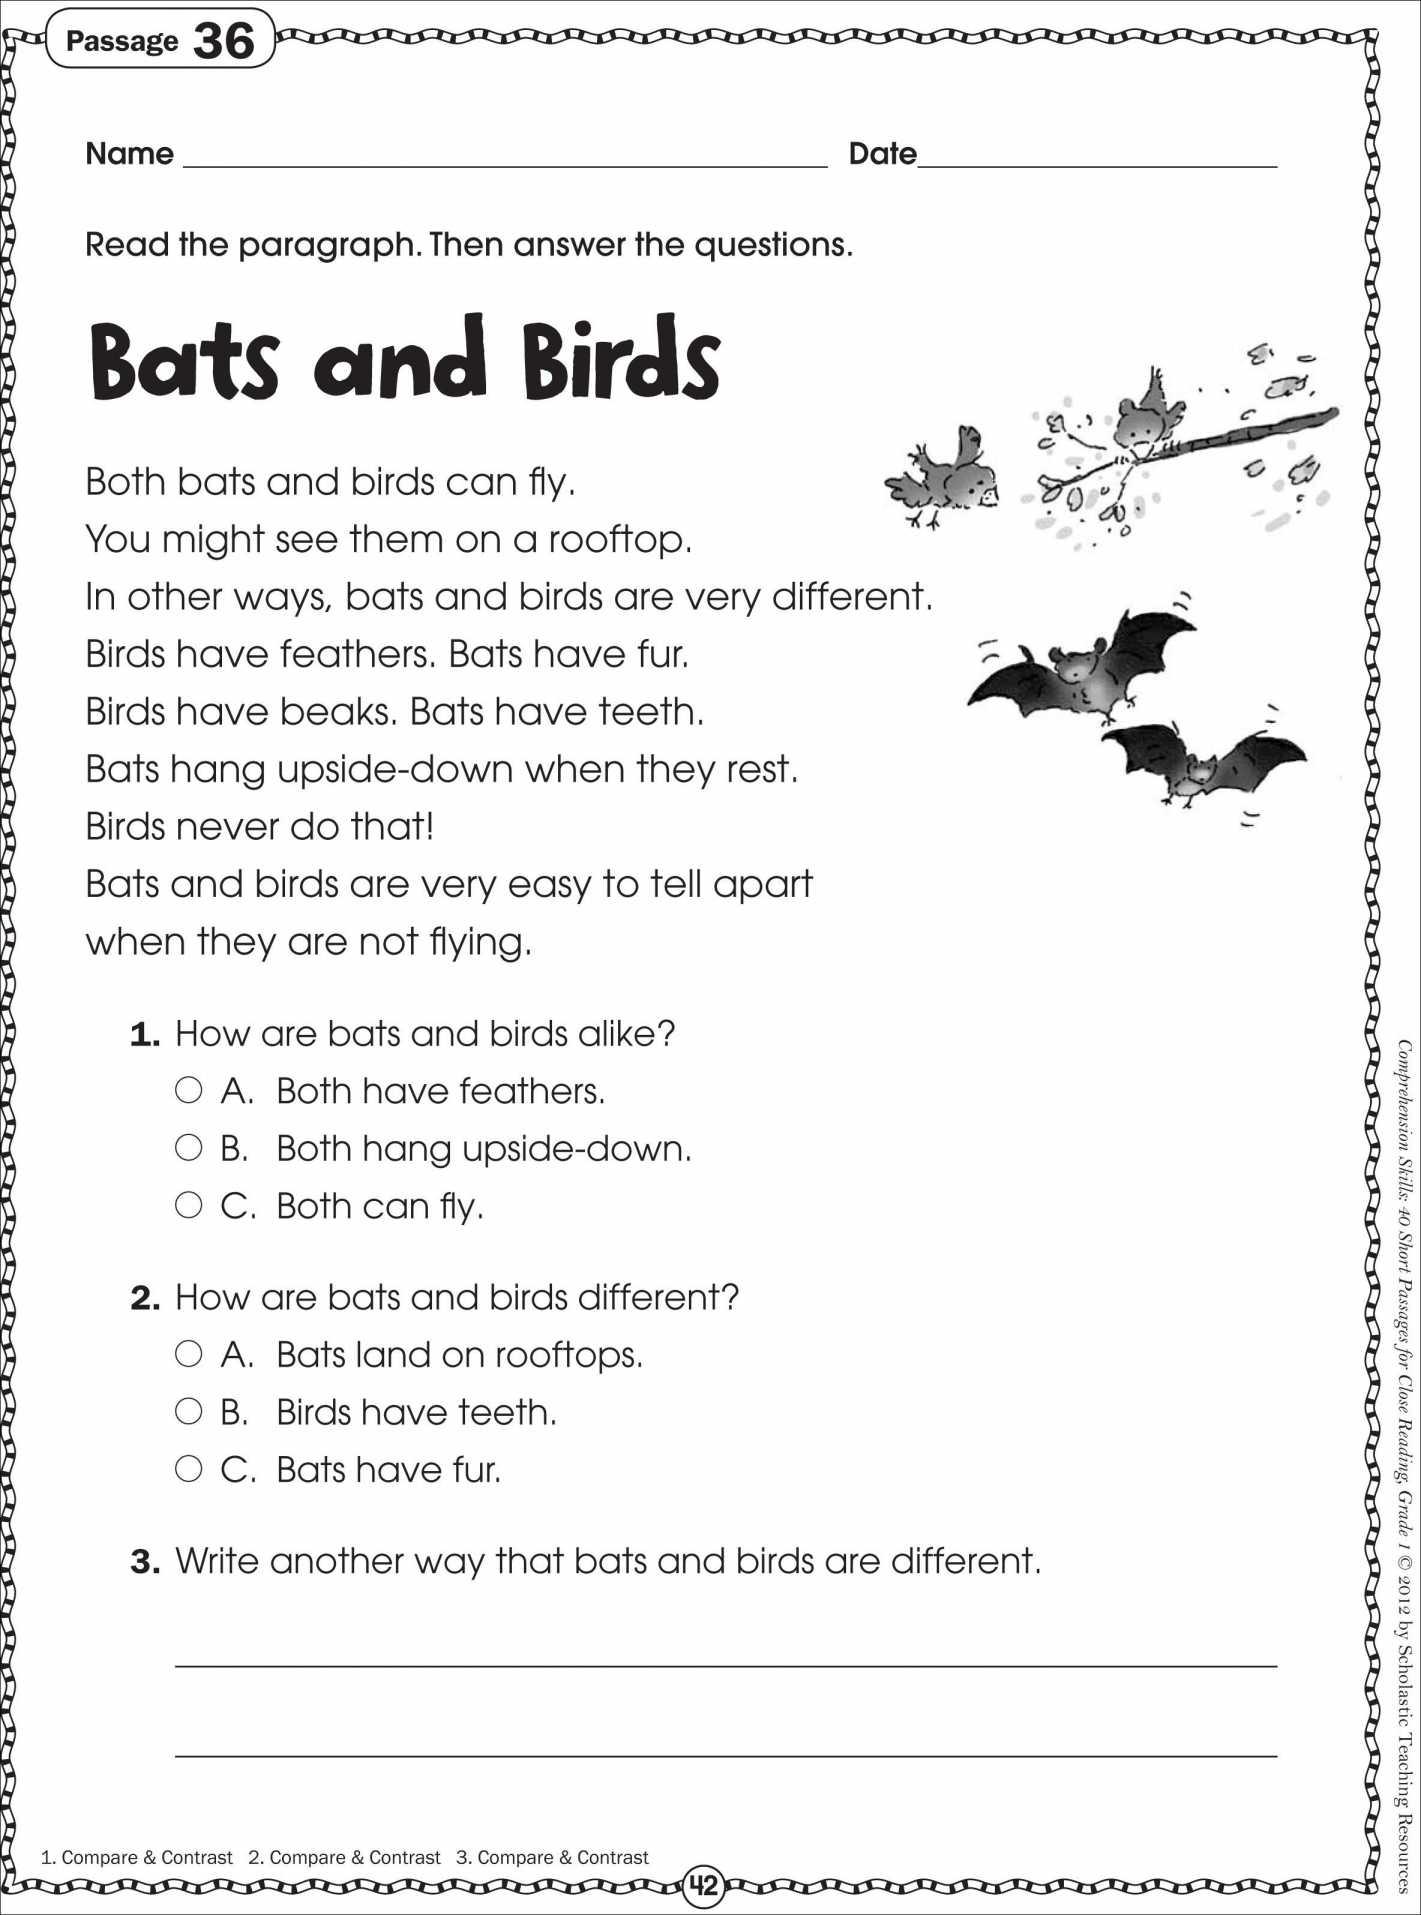 Free Printable Second Grade Reading Comprehension Worksheets | Second Grade Reading Comprehension Printable Worksheets